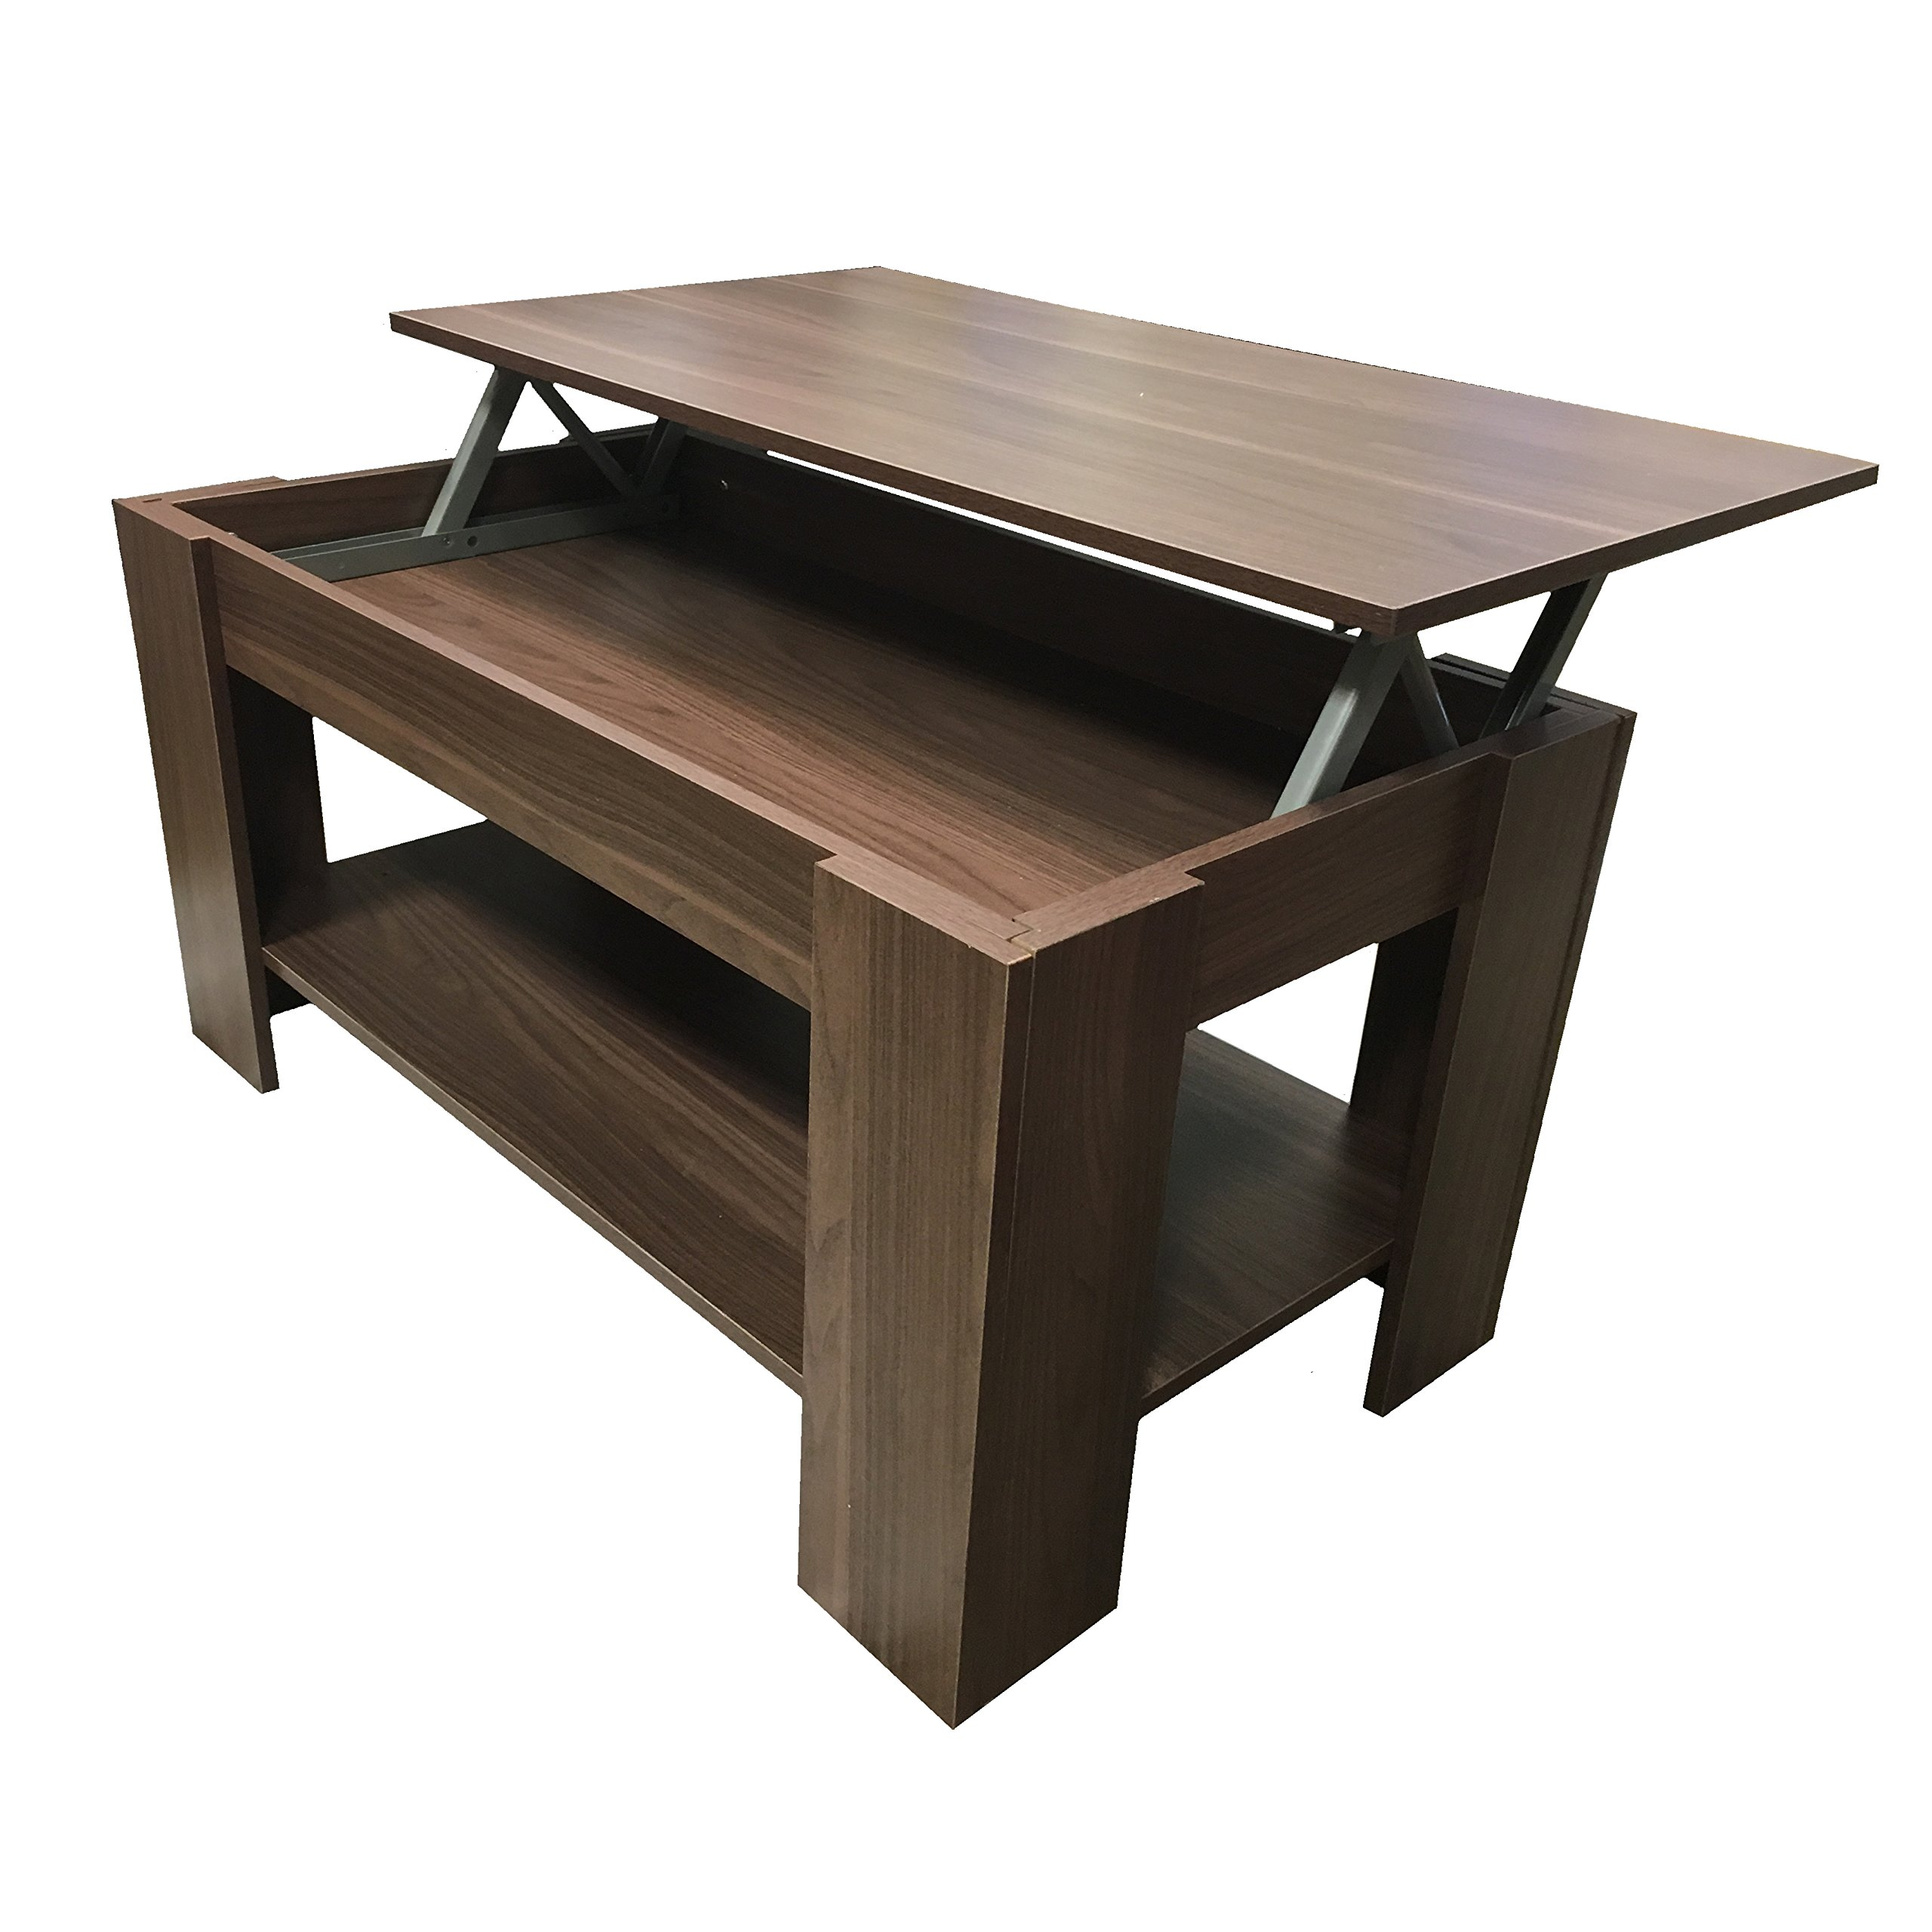 black walnut furniture reviews blogs workanyware co uk u2022 rh blogs workanyware co uk